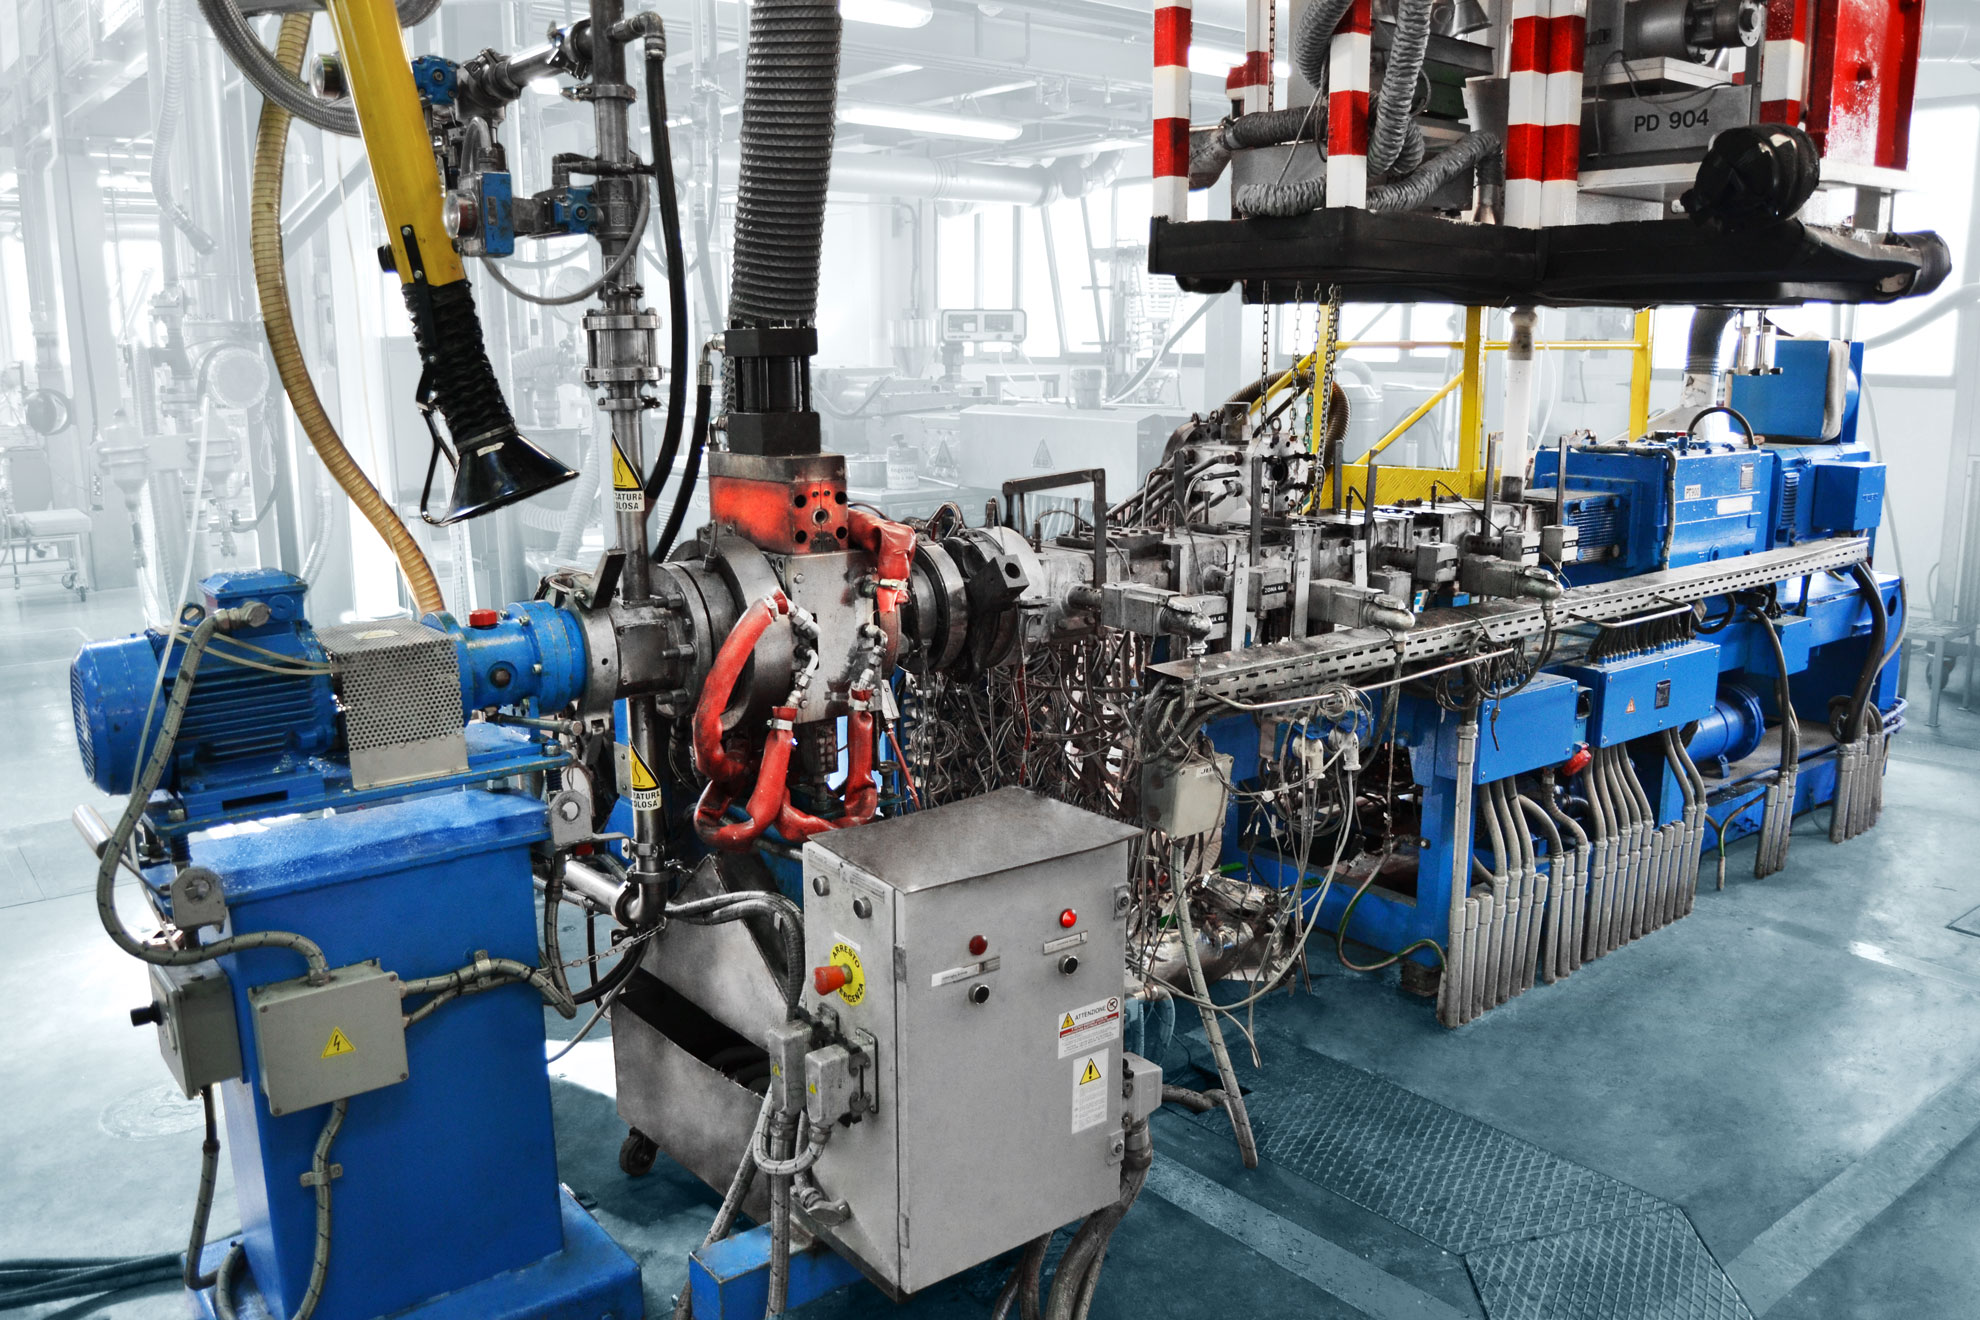 Manutenzione_elettromeccanica_Lean_global_service